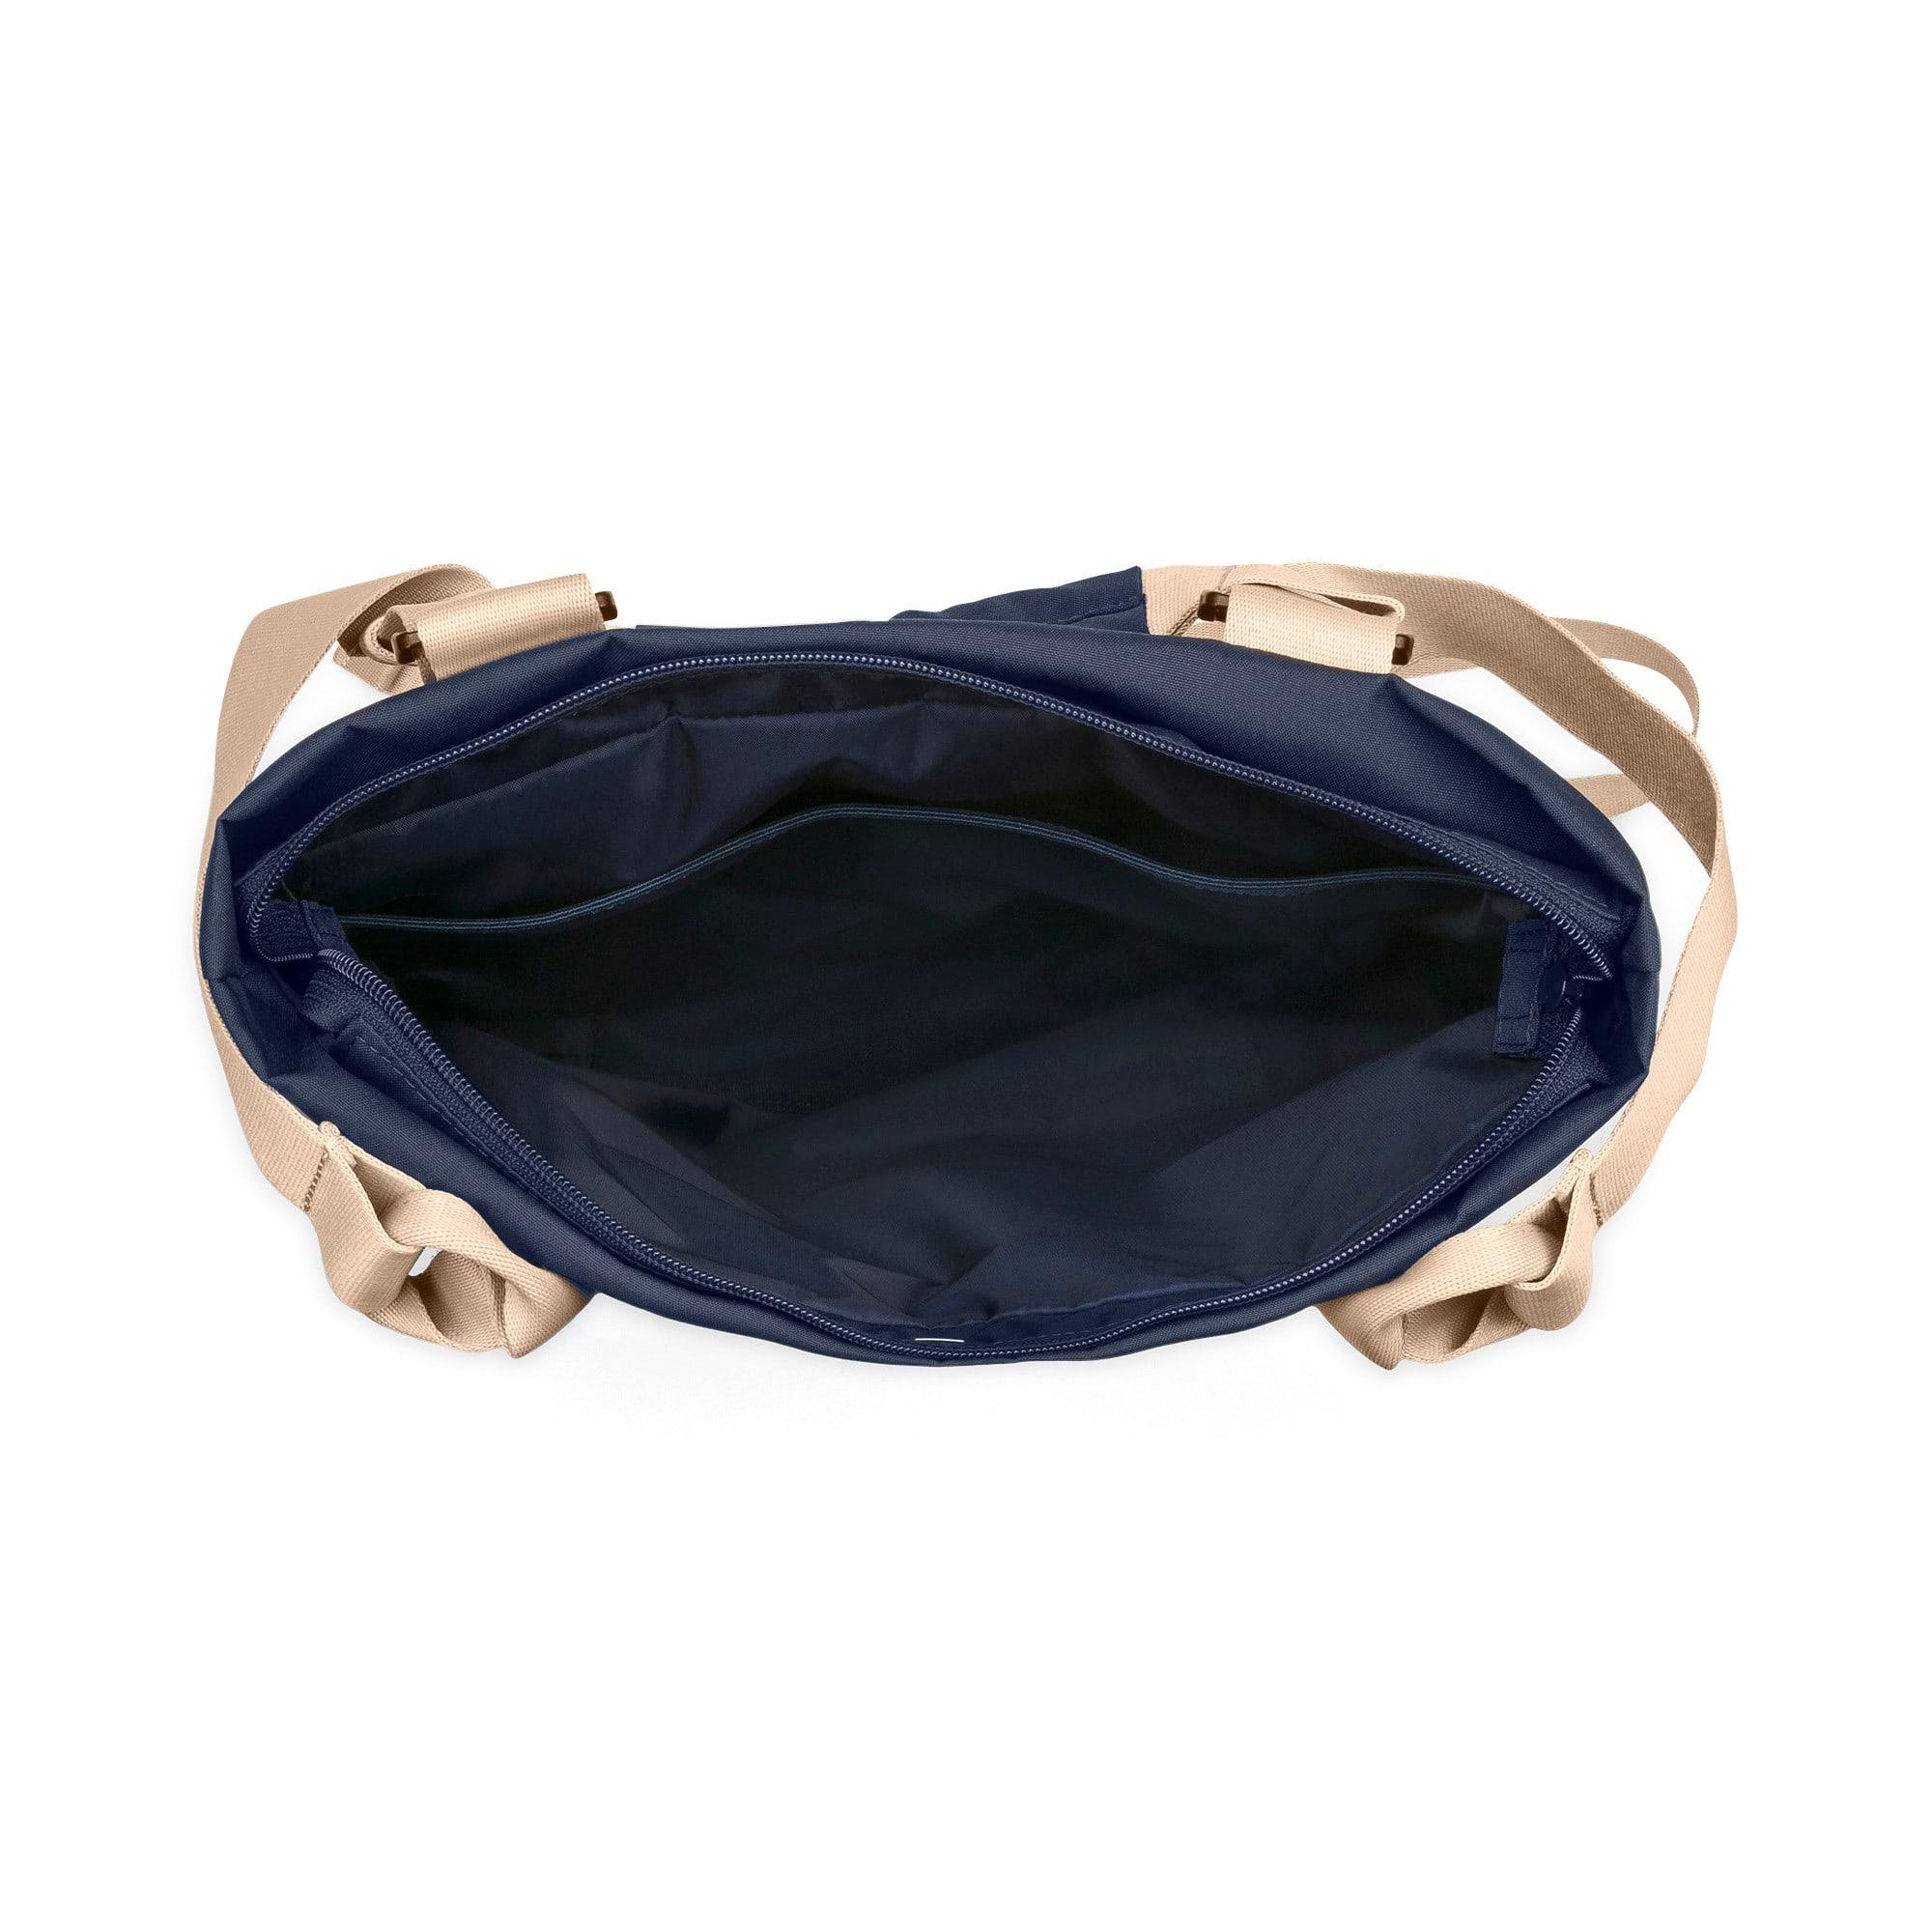 Thumbnail 4 of Olympique de Marseille Premium Tote Backpack, Peacoat-Bleu Azur-Beige, medium-IND